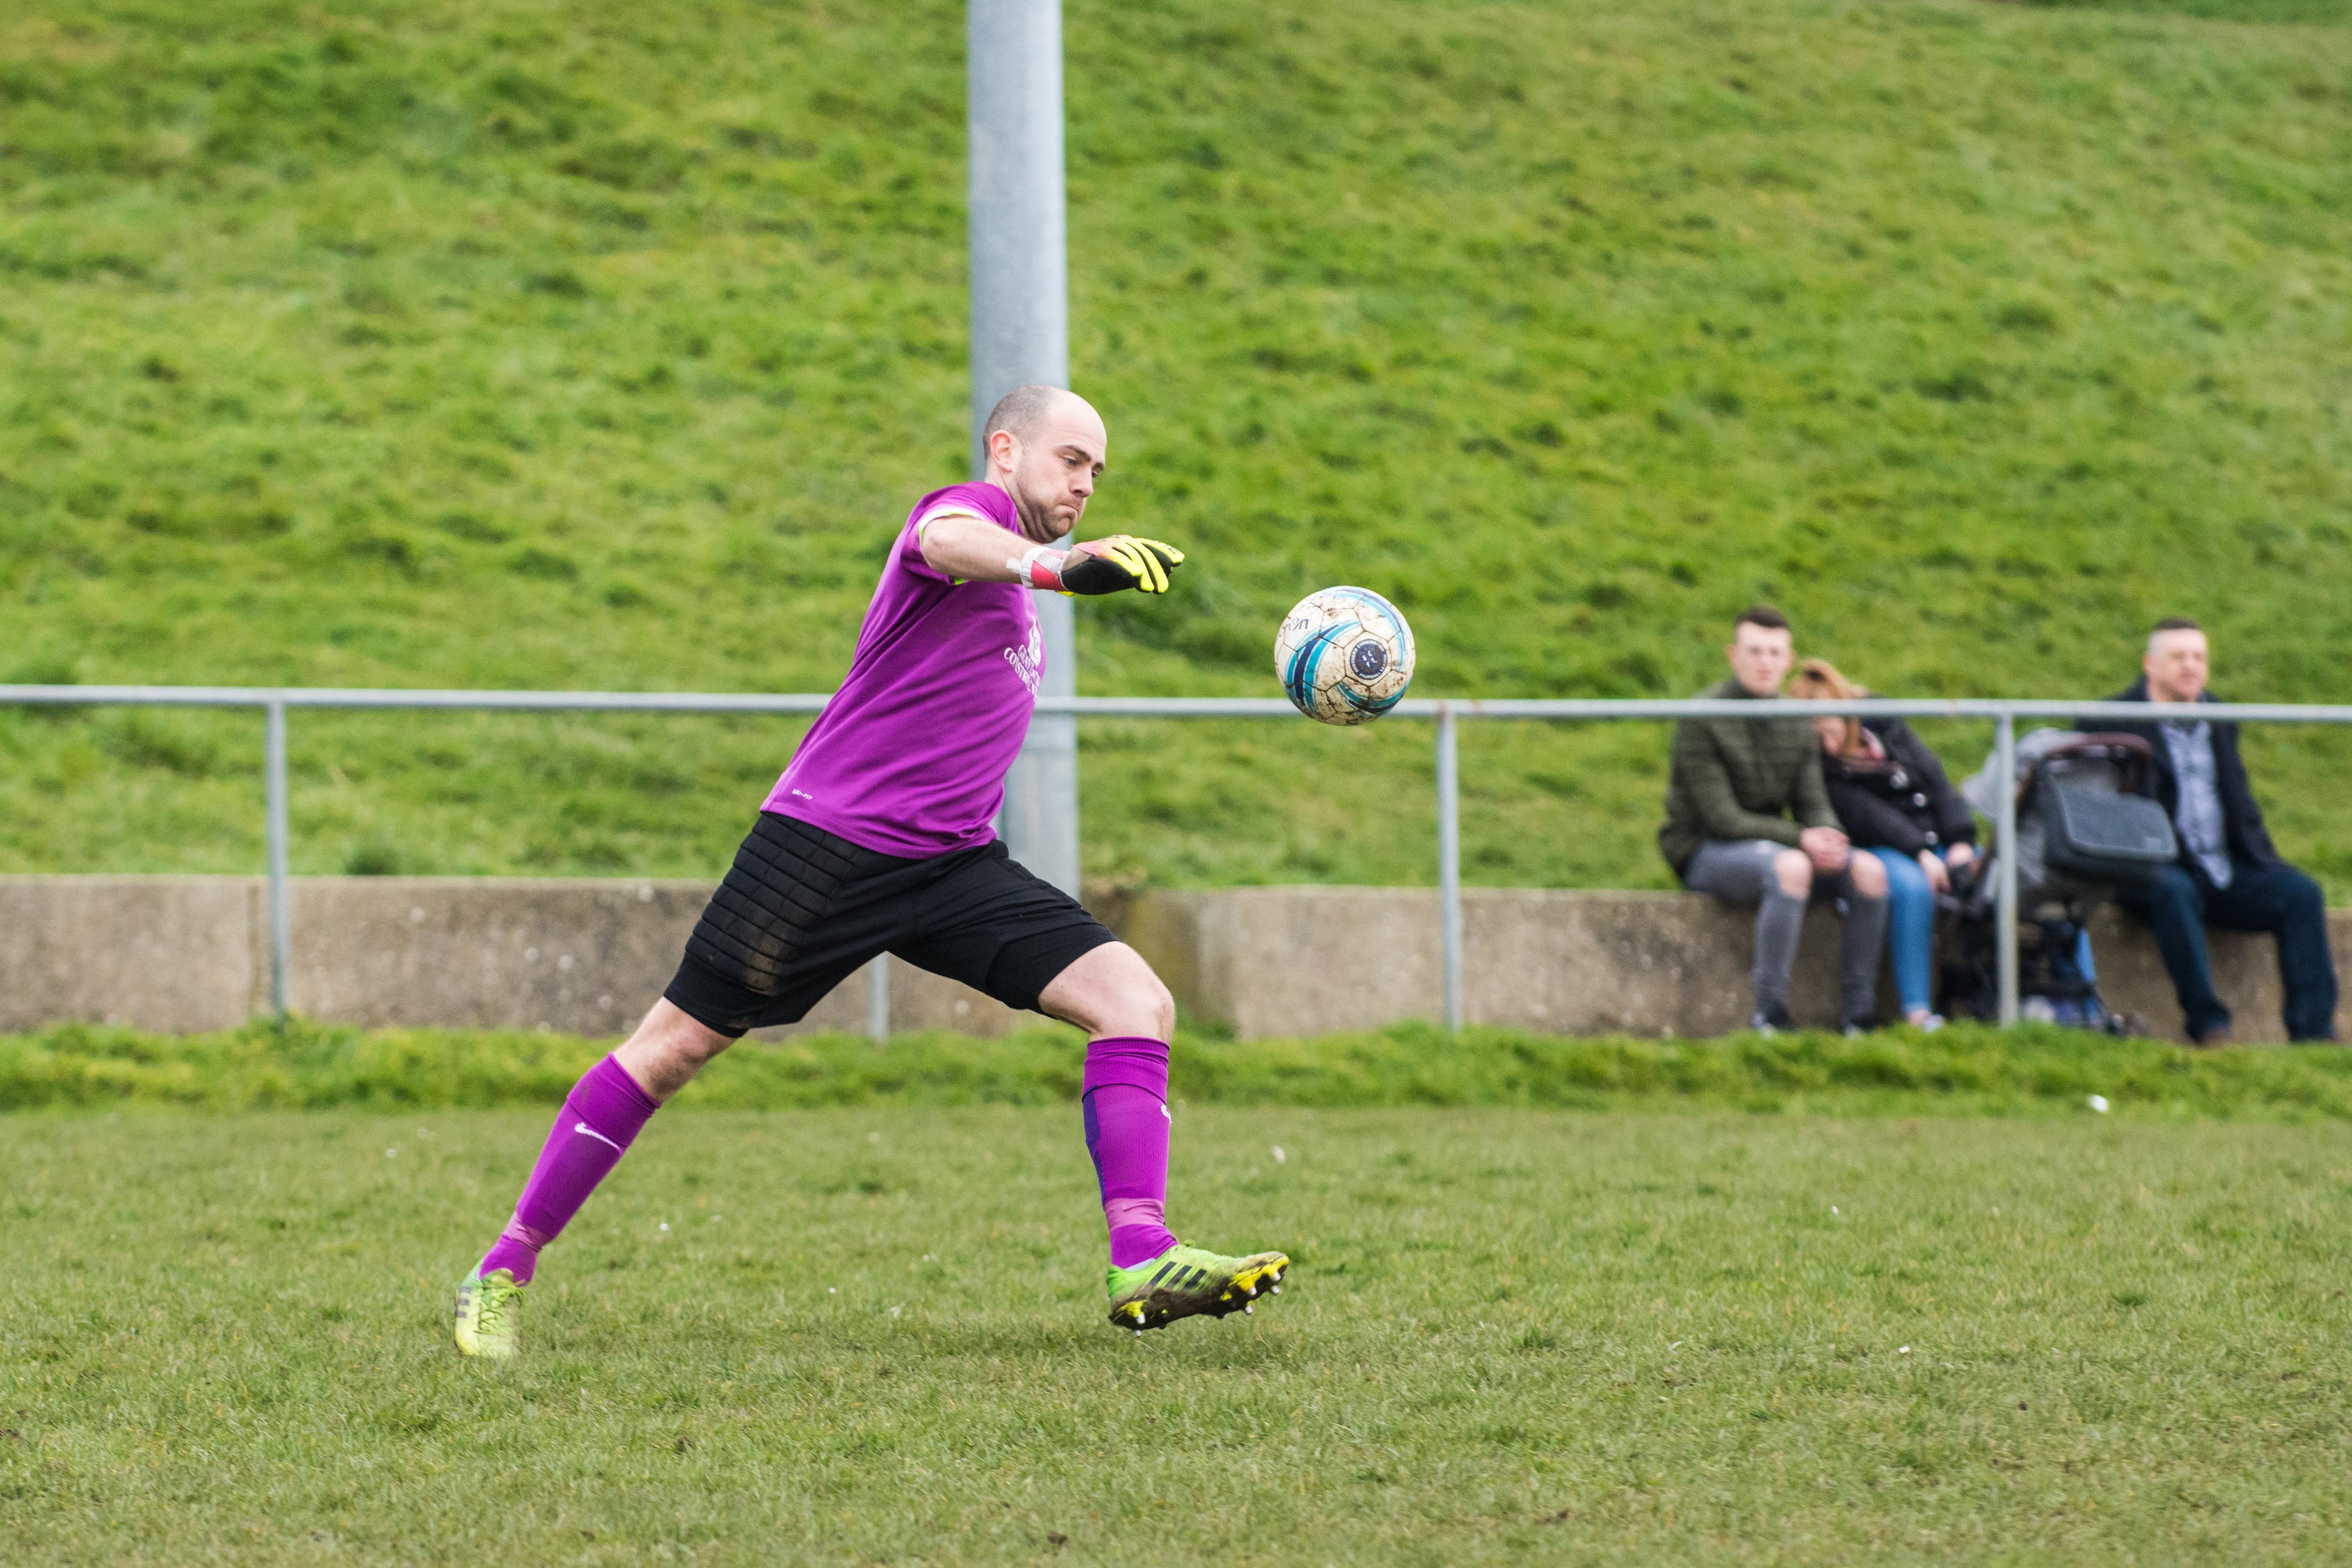 DAVID_JEFFERY Mile Oak FC vs Hailsham Town FC 24.03.18 80